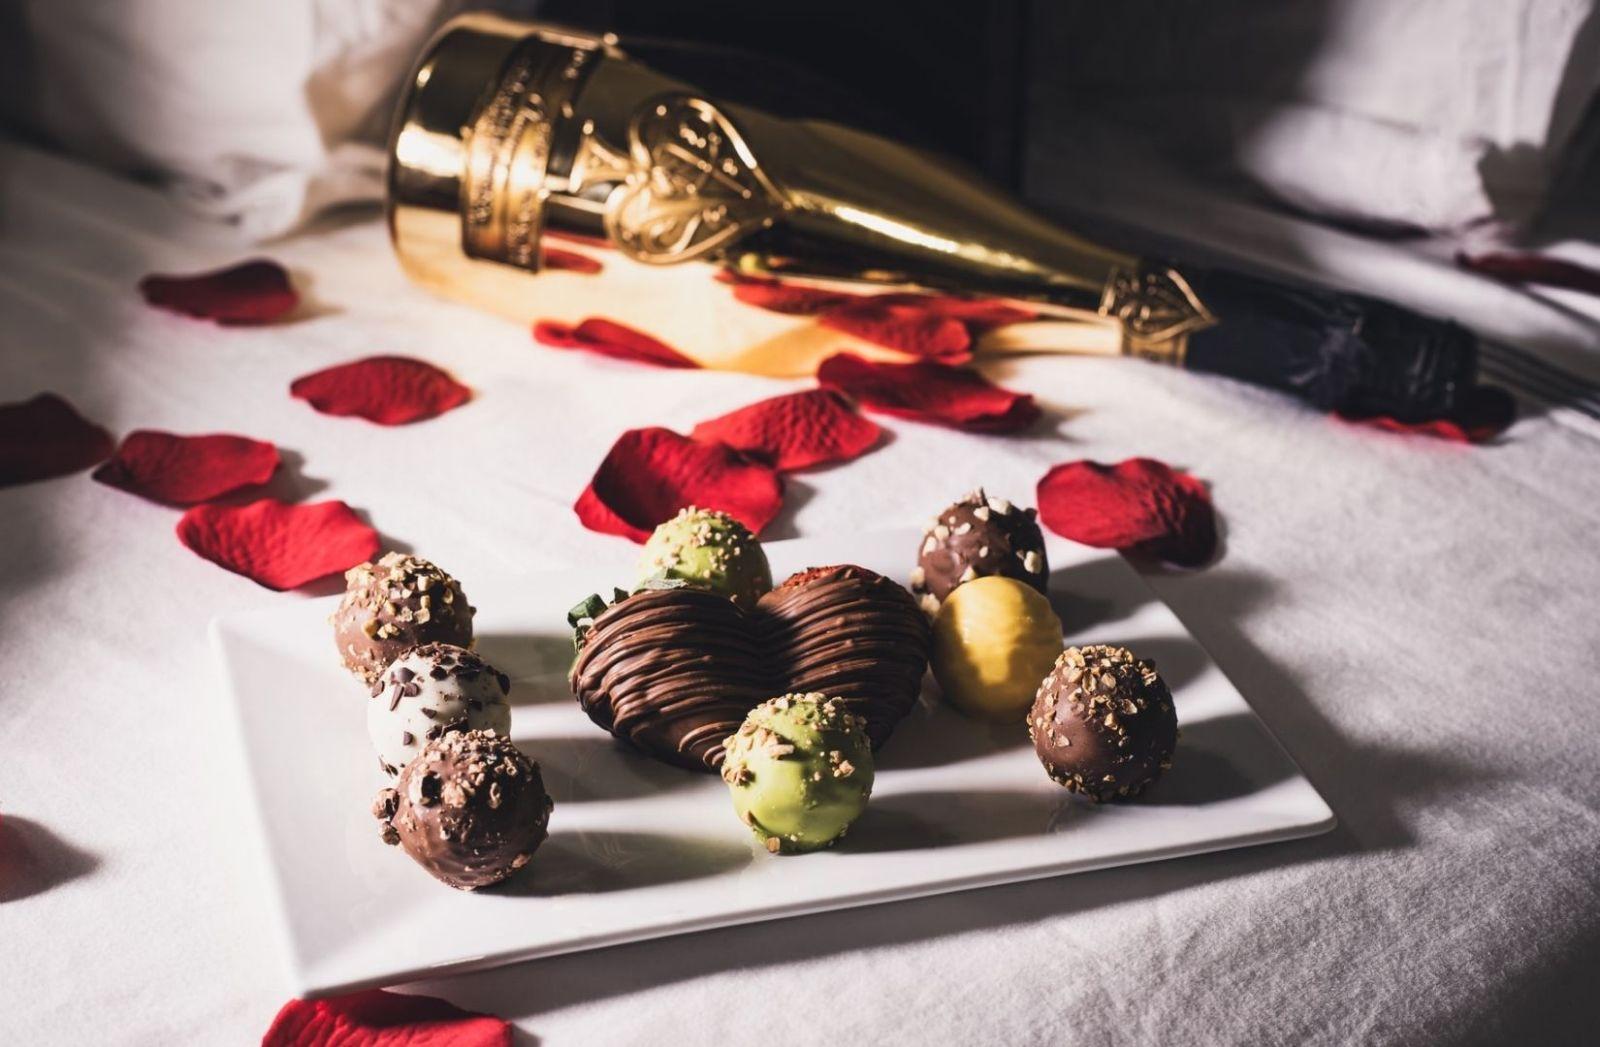 Champus und Schokolade. (Foto: Thula Na, Unsplash.com)